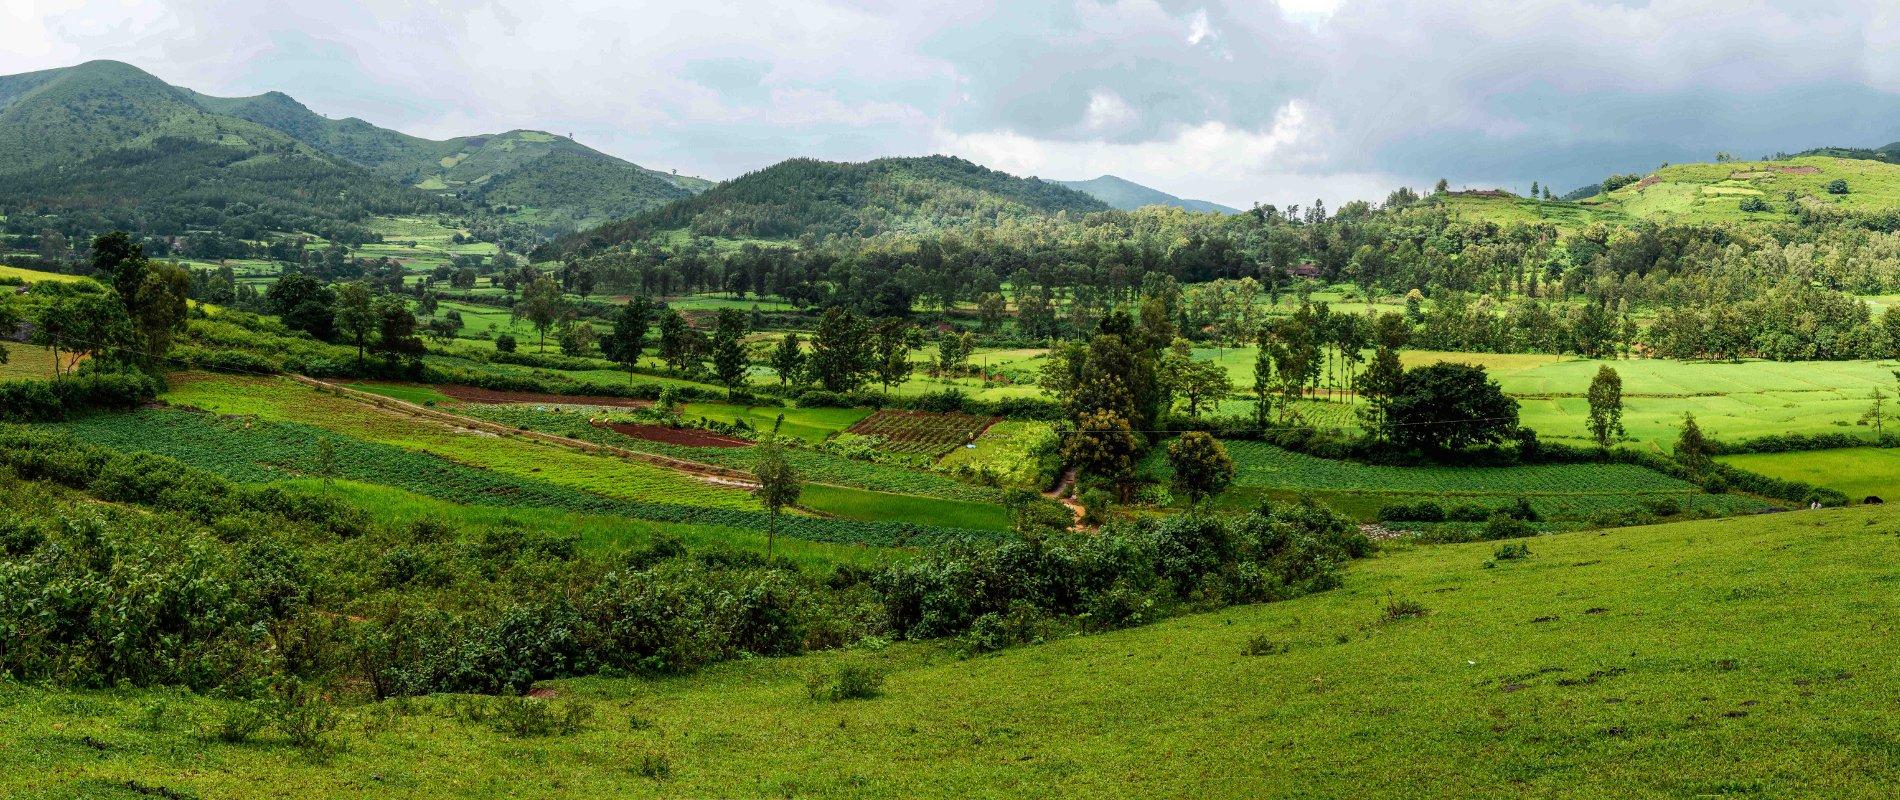 Agroforesterie dans la vallée indienne d'Araku